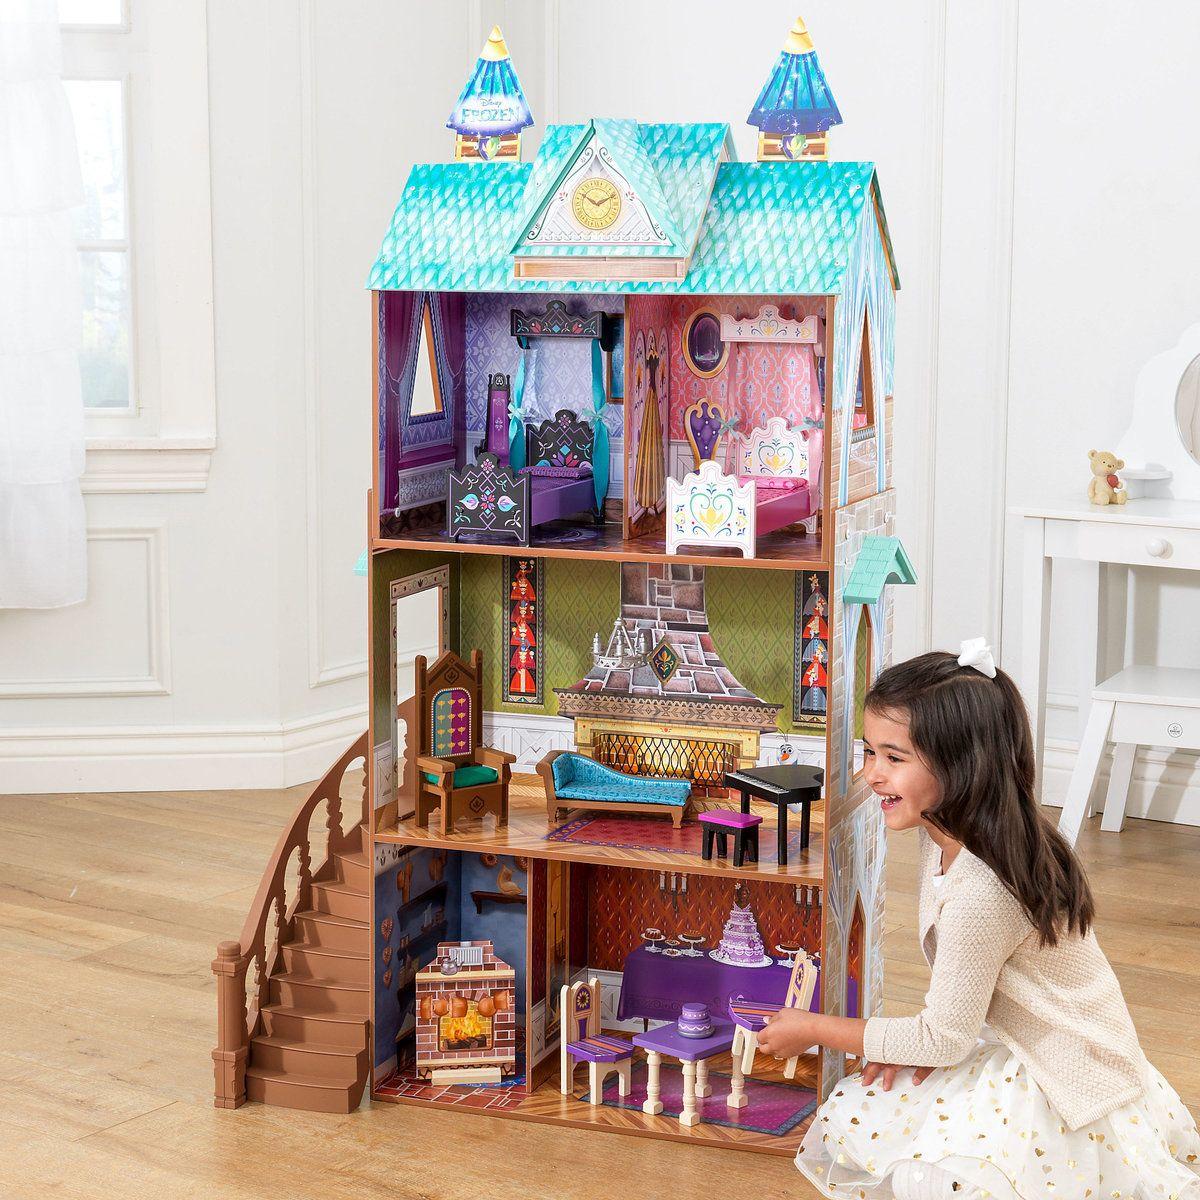 Disney 65945 Frozen Arendelle Palace Dollhouse Doll